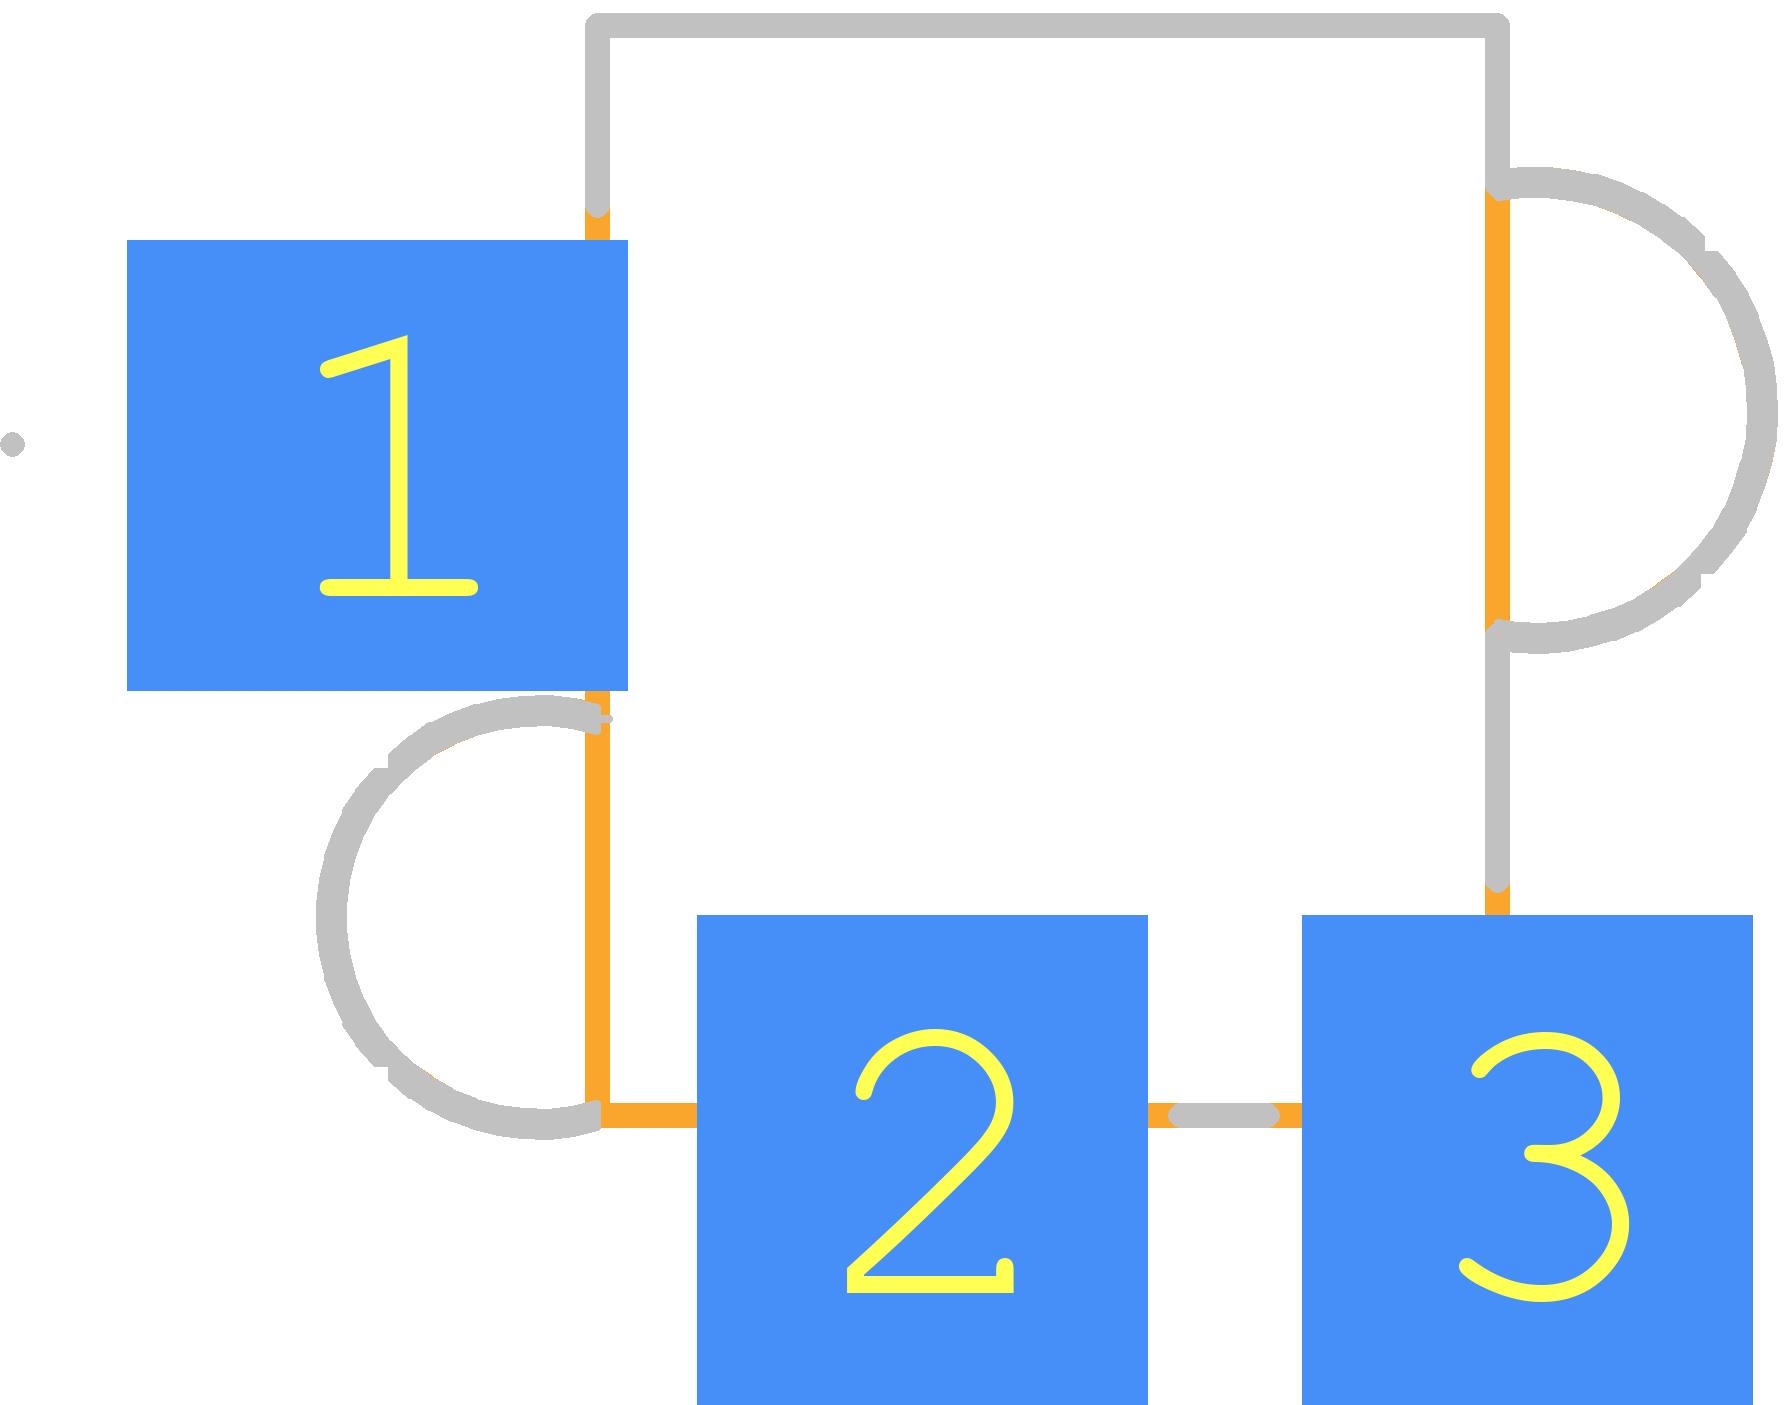 PJ-070AH-SMT-TR - CUI PCB footprint - Other - PJ-070AH-SMT-TR